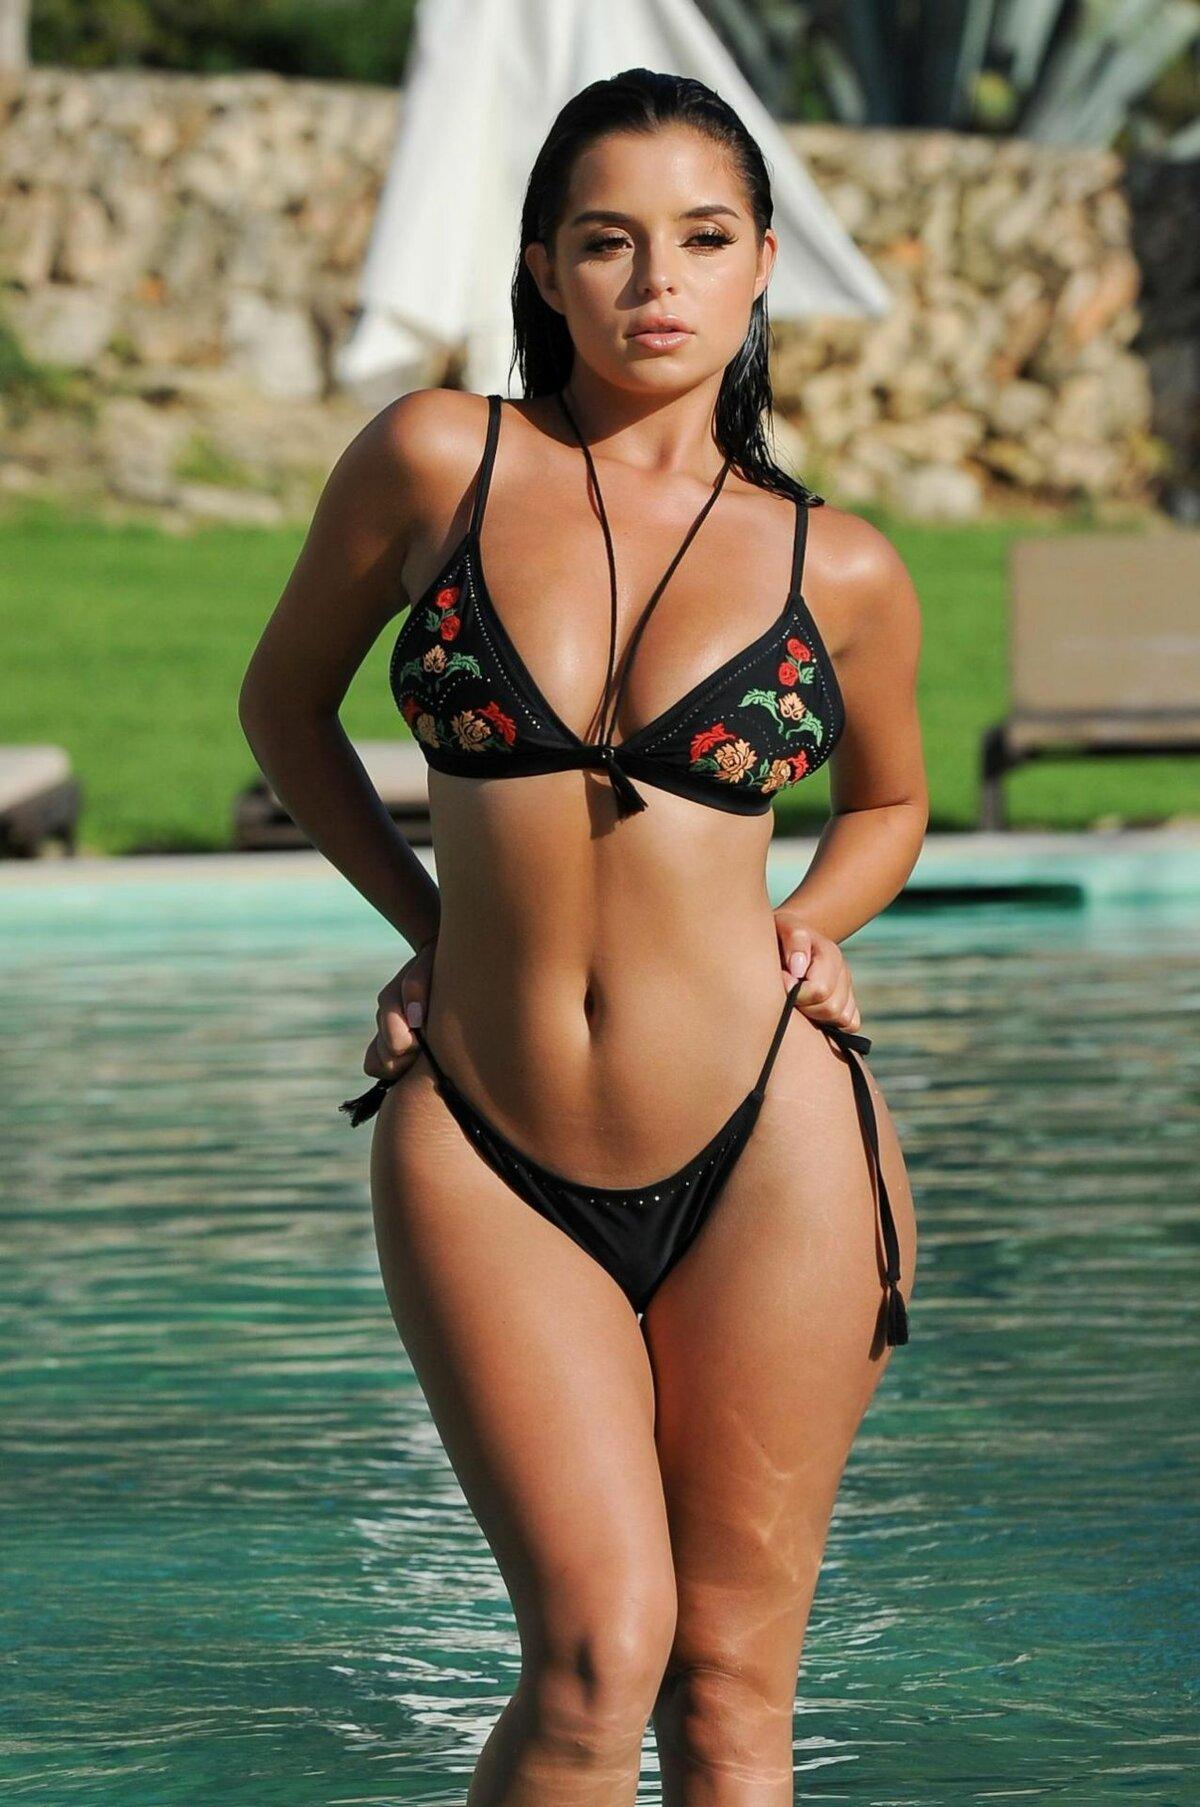 Bikini Demi Rose Mawby nudes (74 photos), Pussy, Bikini, Twitter, swimsuit 2006